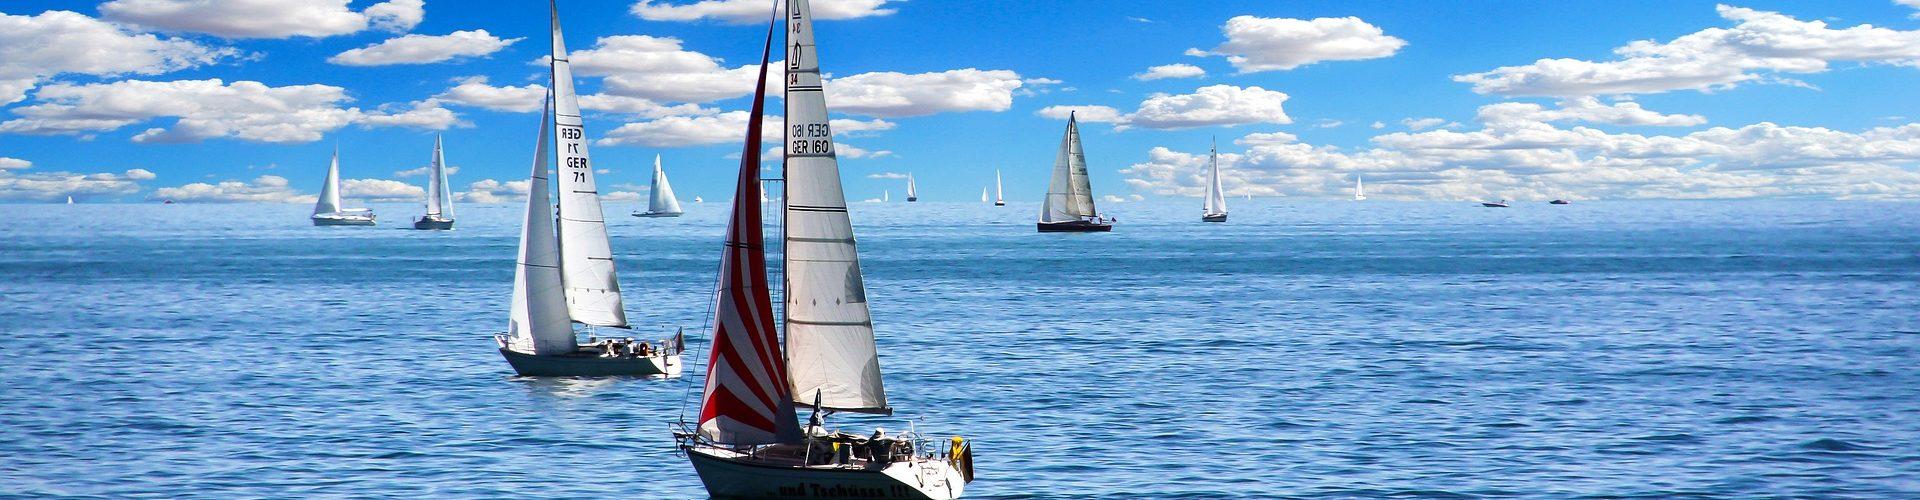 segeln lernen in Hof segelschein machen in Hof 1920x500 - Segeln lernen in Hof